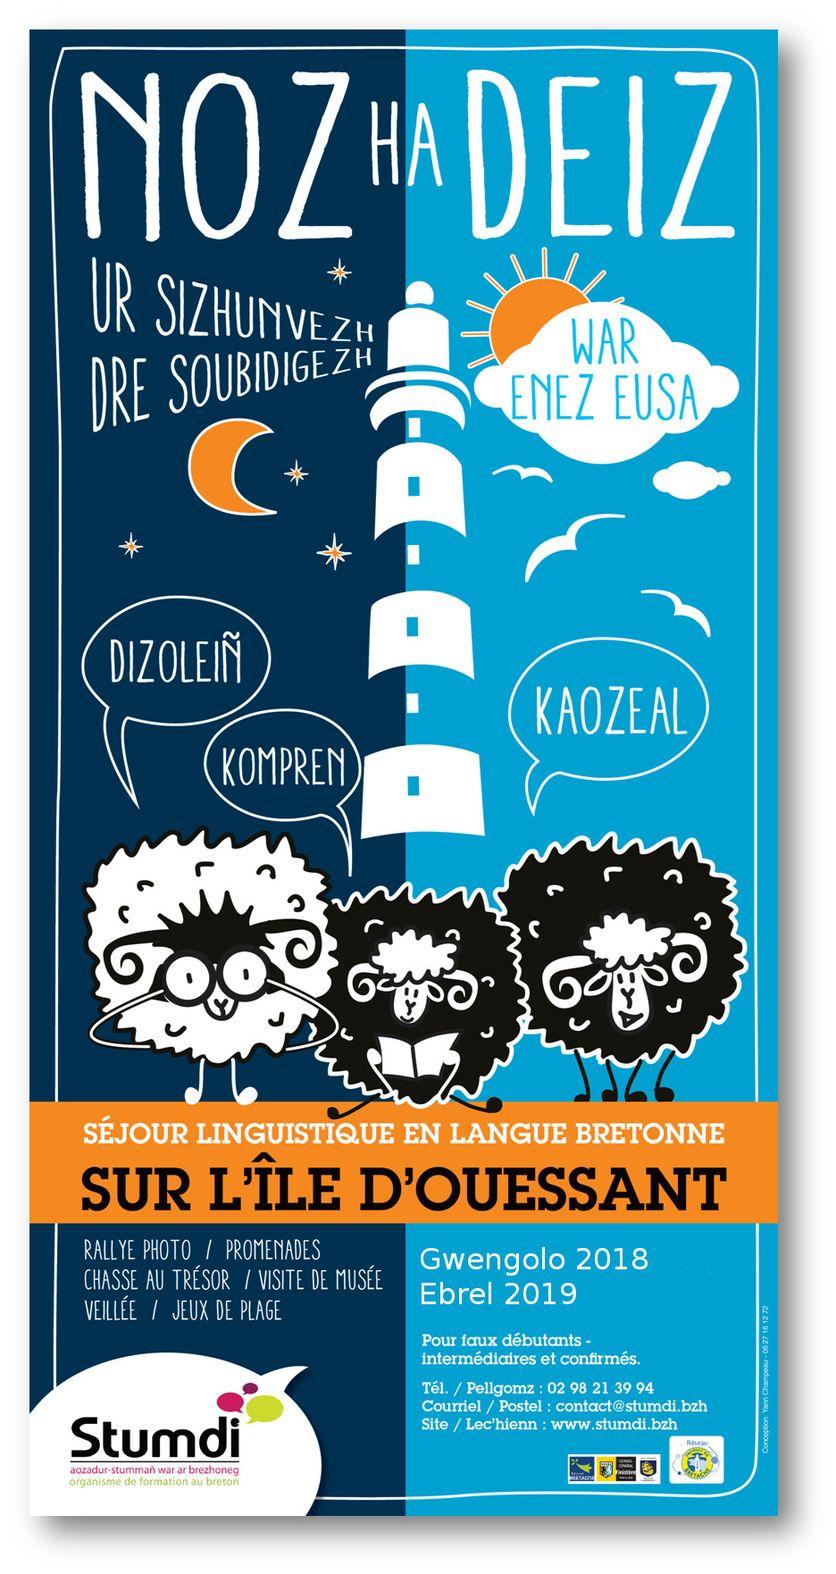 - Stumdi organisme de formation en langue bretonne